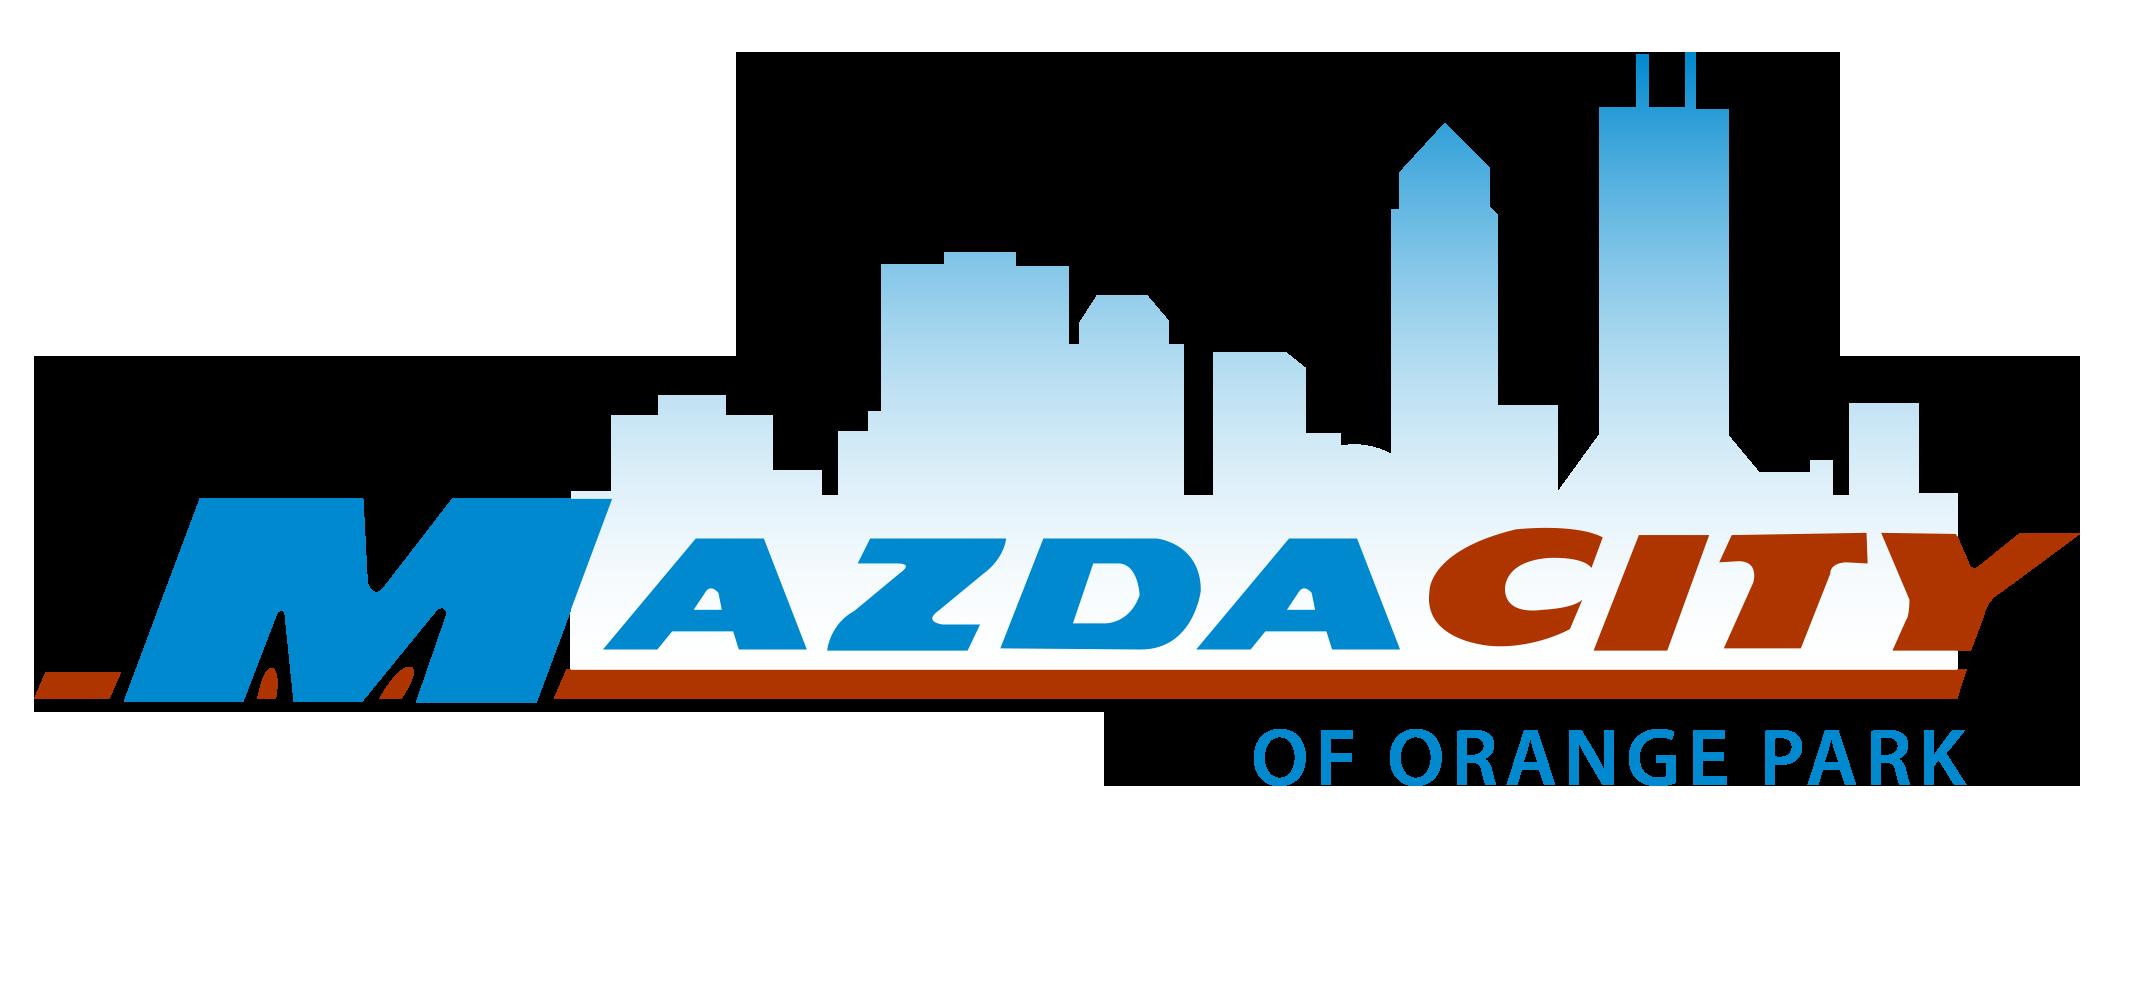 Lovely Jacksonvilleu0027s Mazda City Of Orange Park   New 2018 2019 Mazda U0026 Used Cars    Serving Orange Park, Saint Augustine, Middleburg And Gainesville